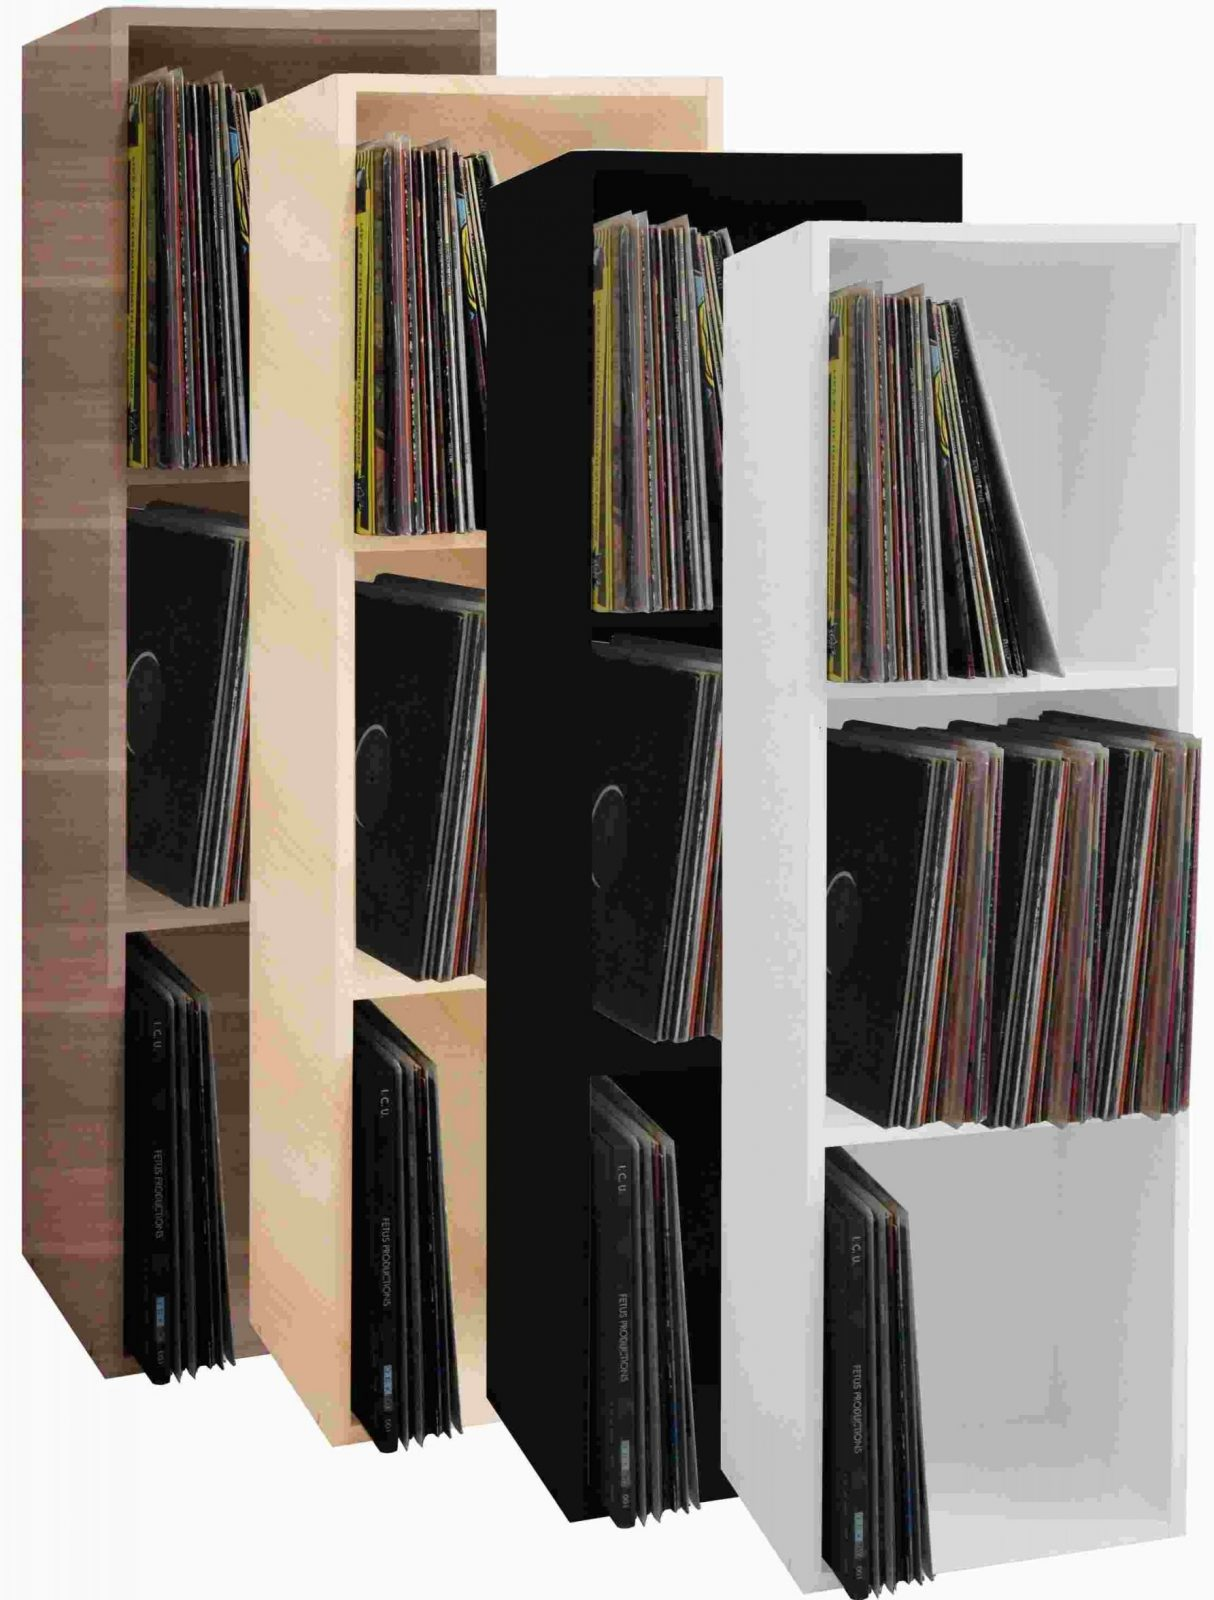 12 Schallplatten Regal Selber Bauen Elegant  Lqaff von Schallplatten Regal Selber Bauen Bild